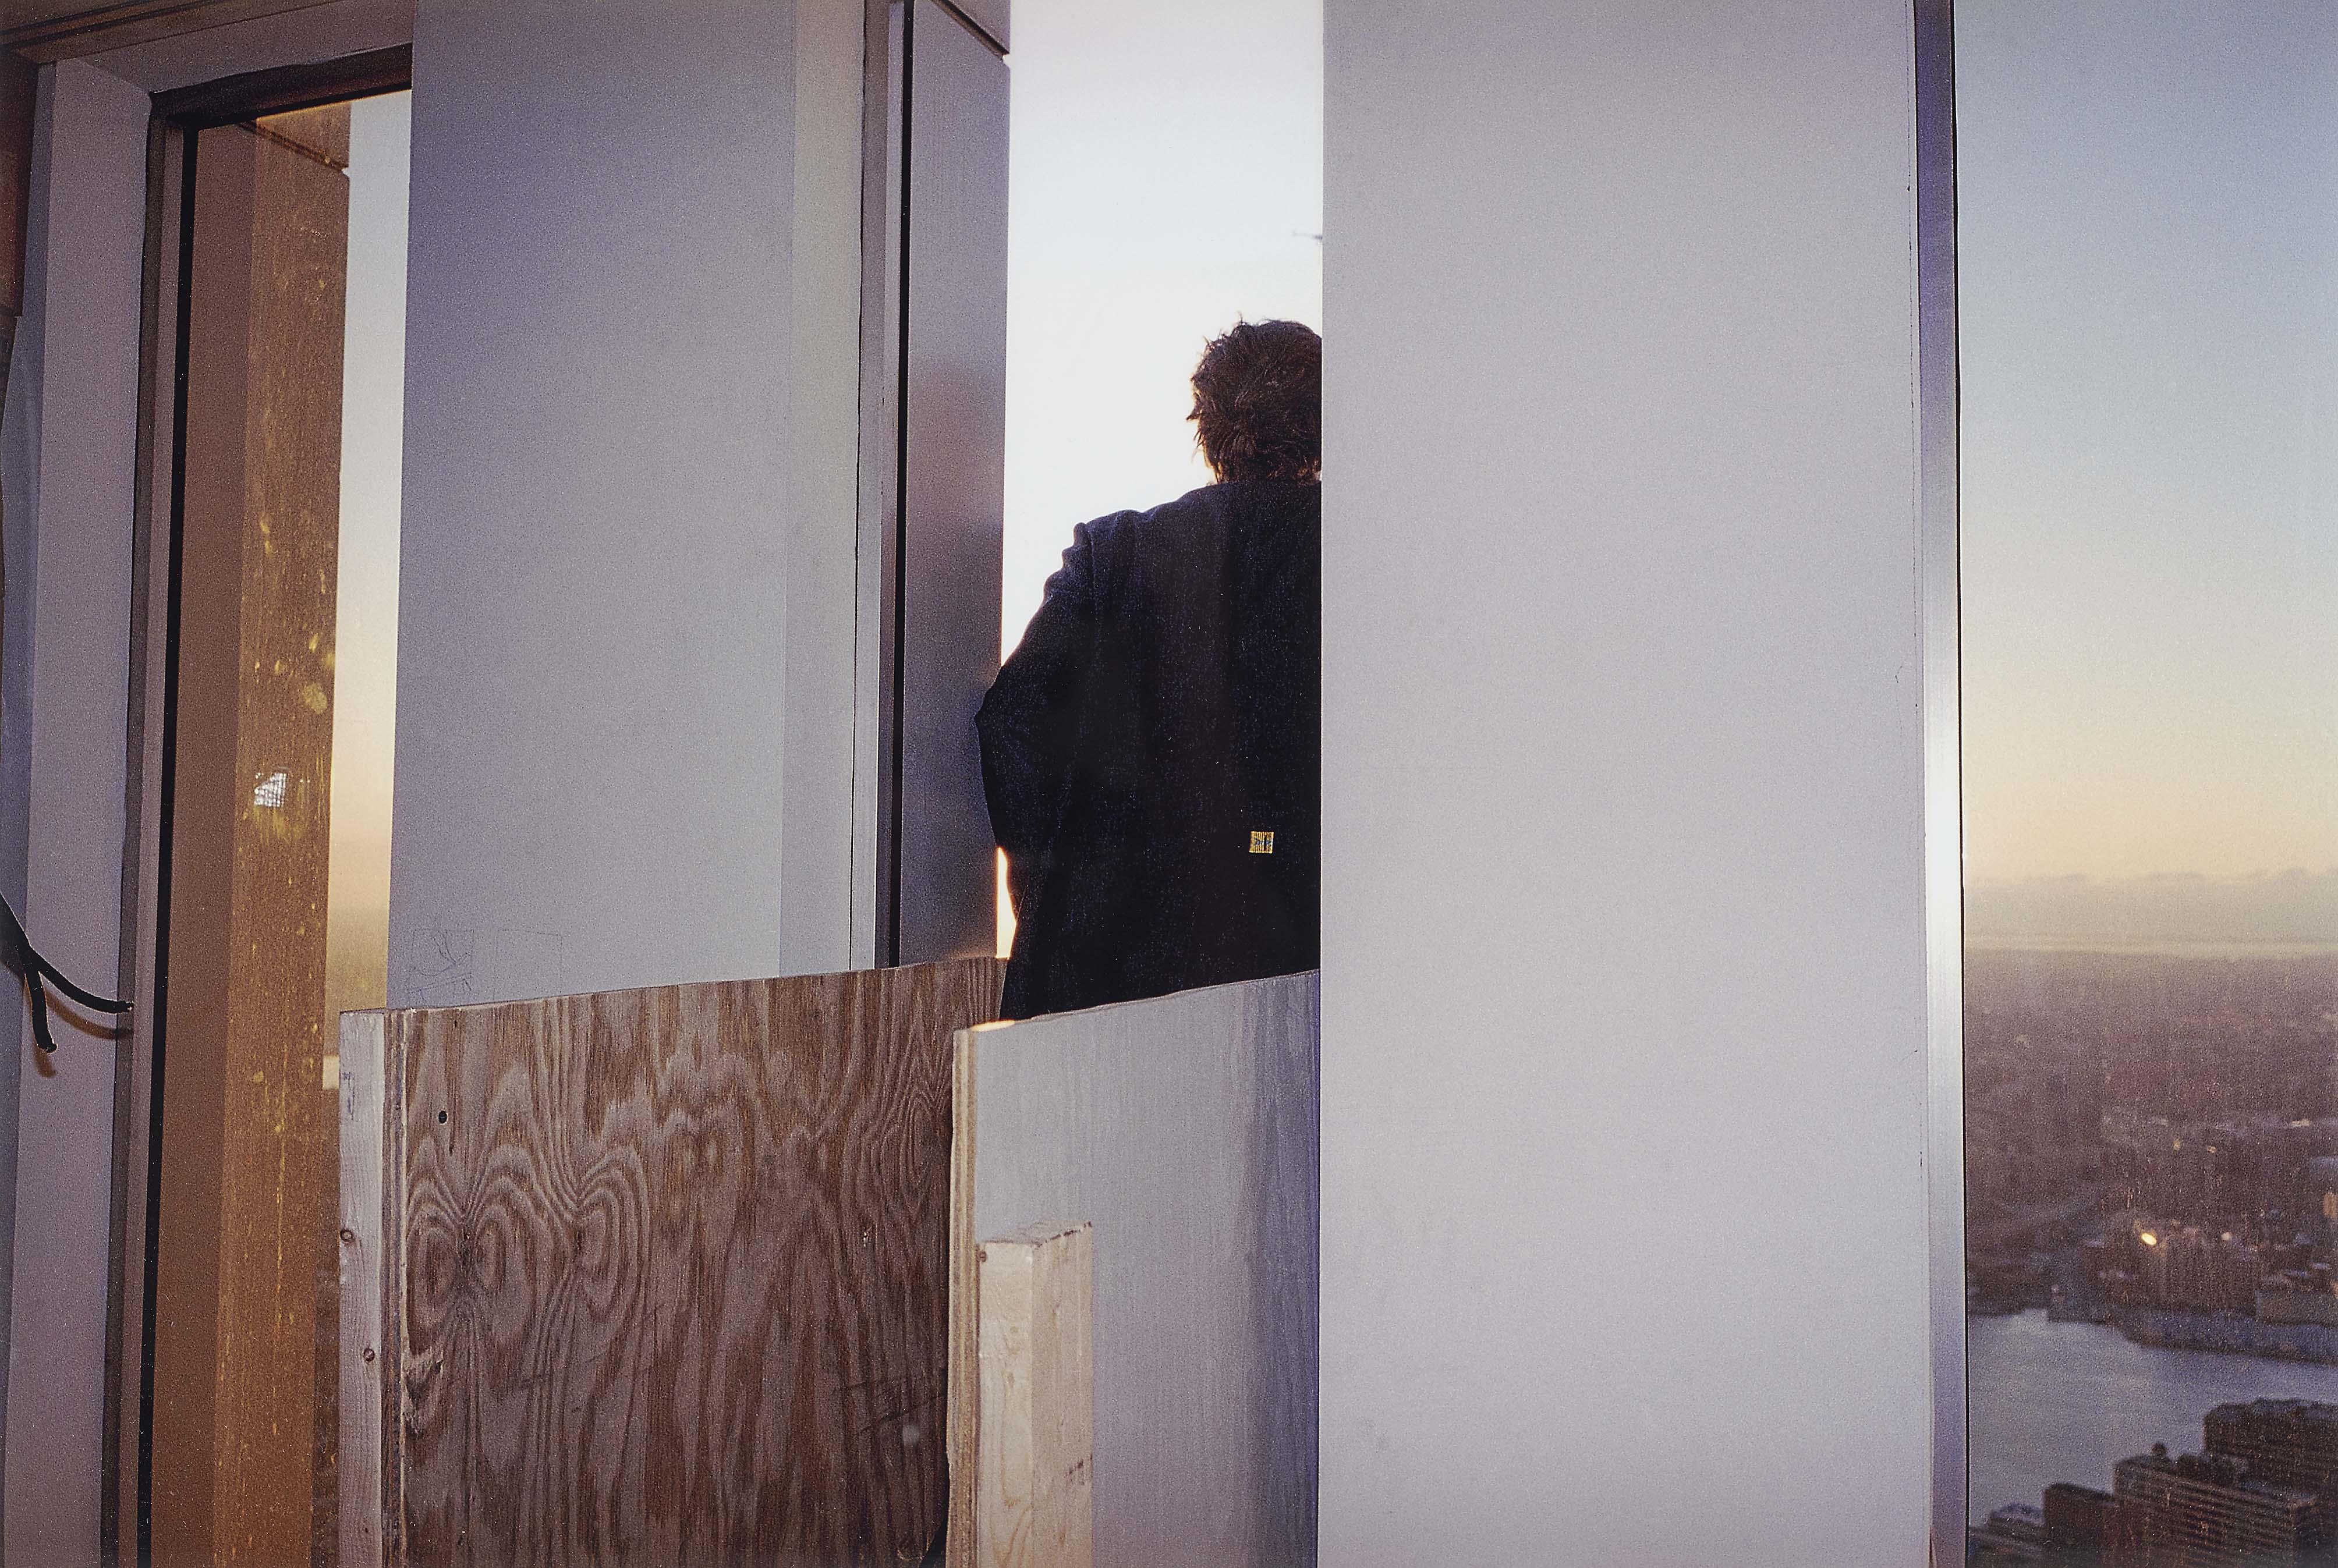 Gelitin-The-B-Thing-March-2000-installation-91st-Floor-of-WTC-1.jpg